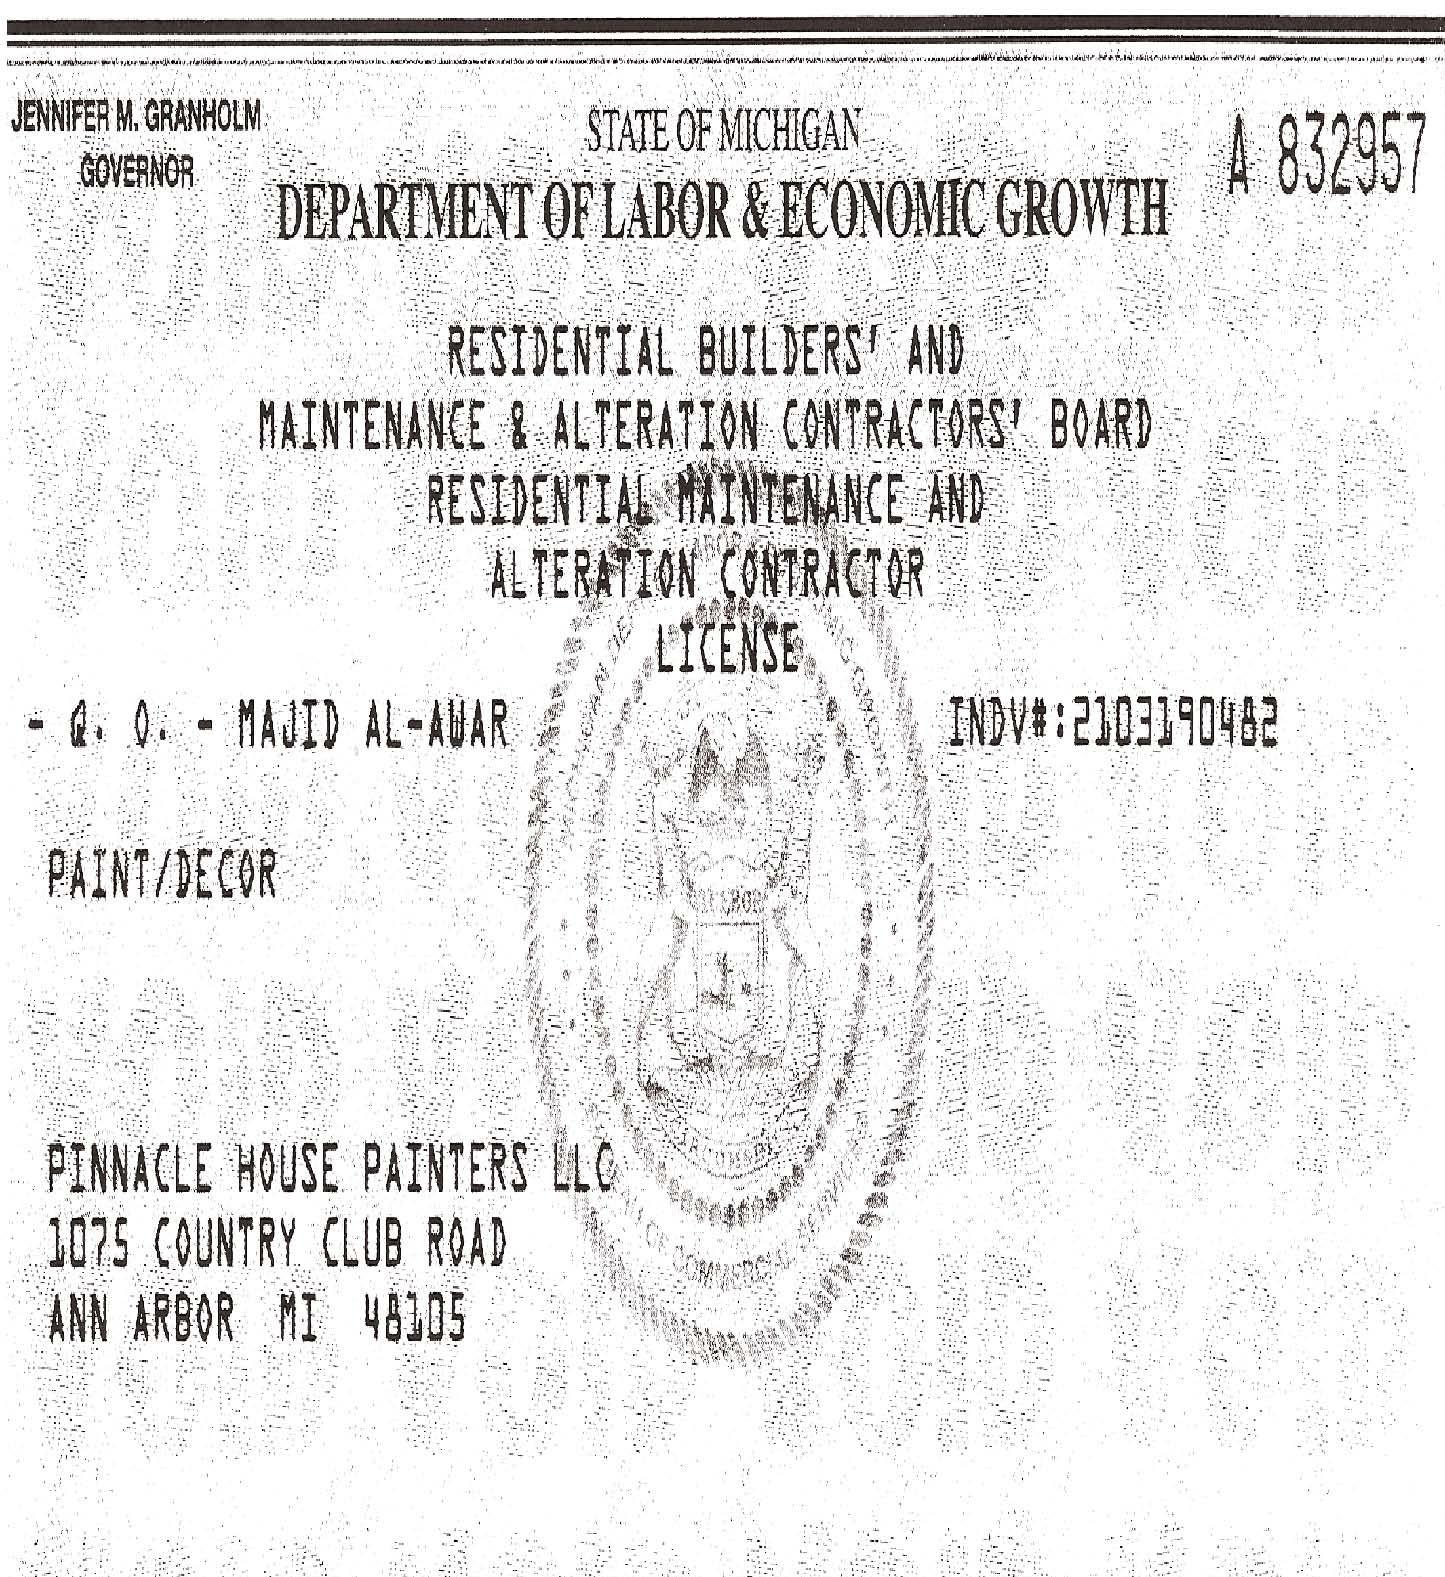 License & Insurance – Pinnacle